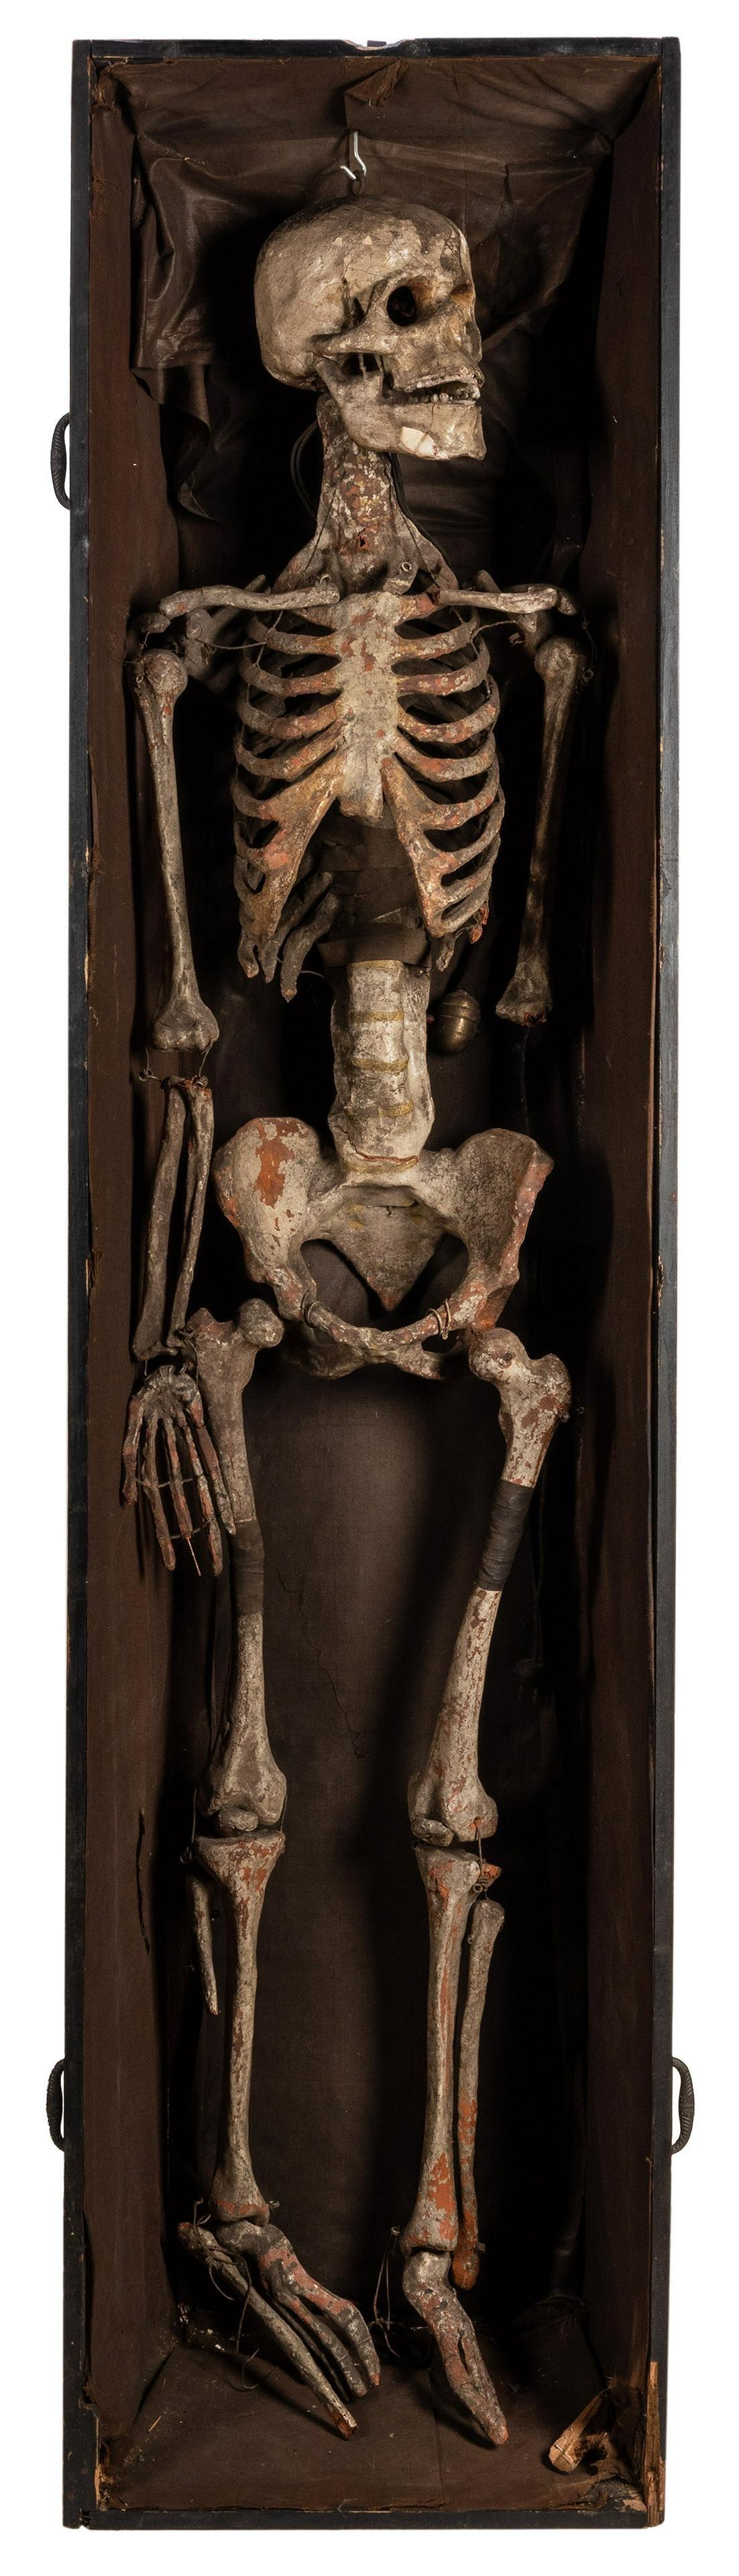 Fraternal Order Skeleton and Coffin Display.